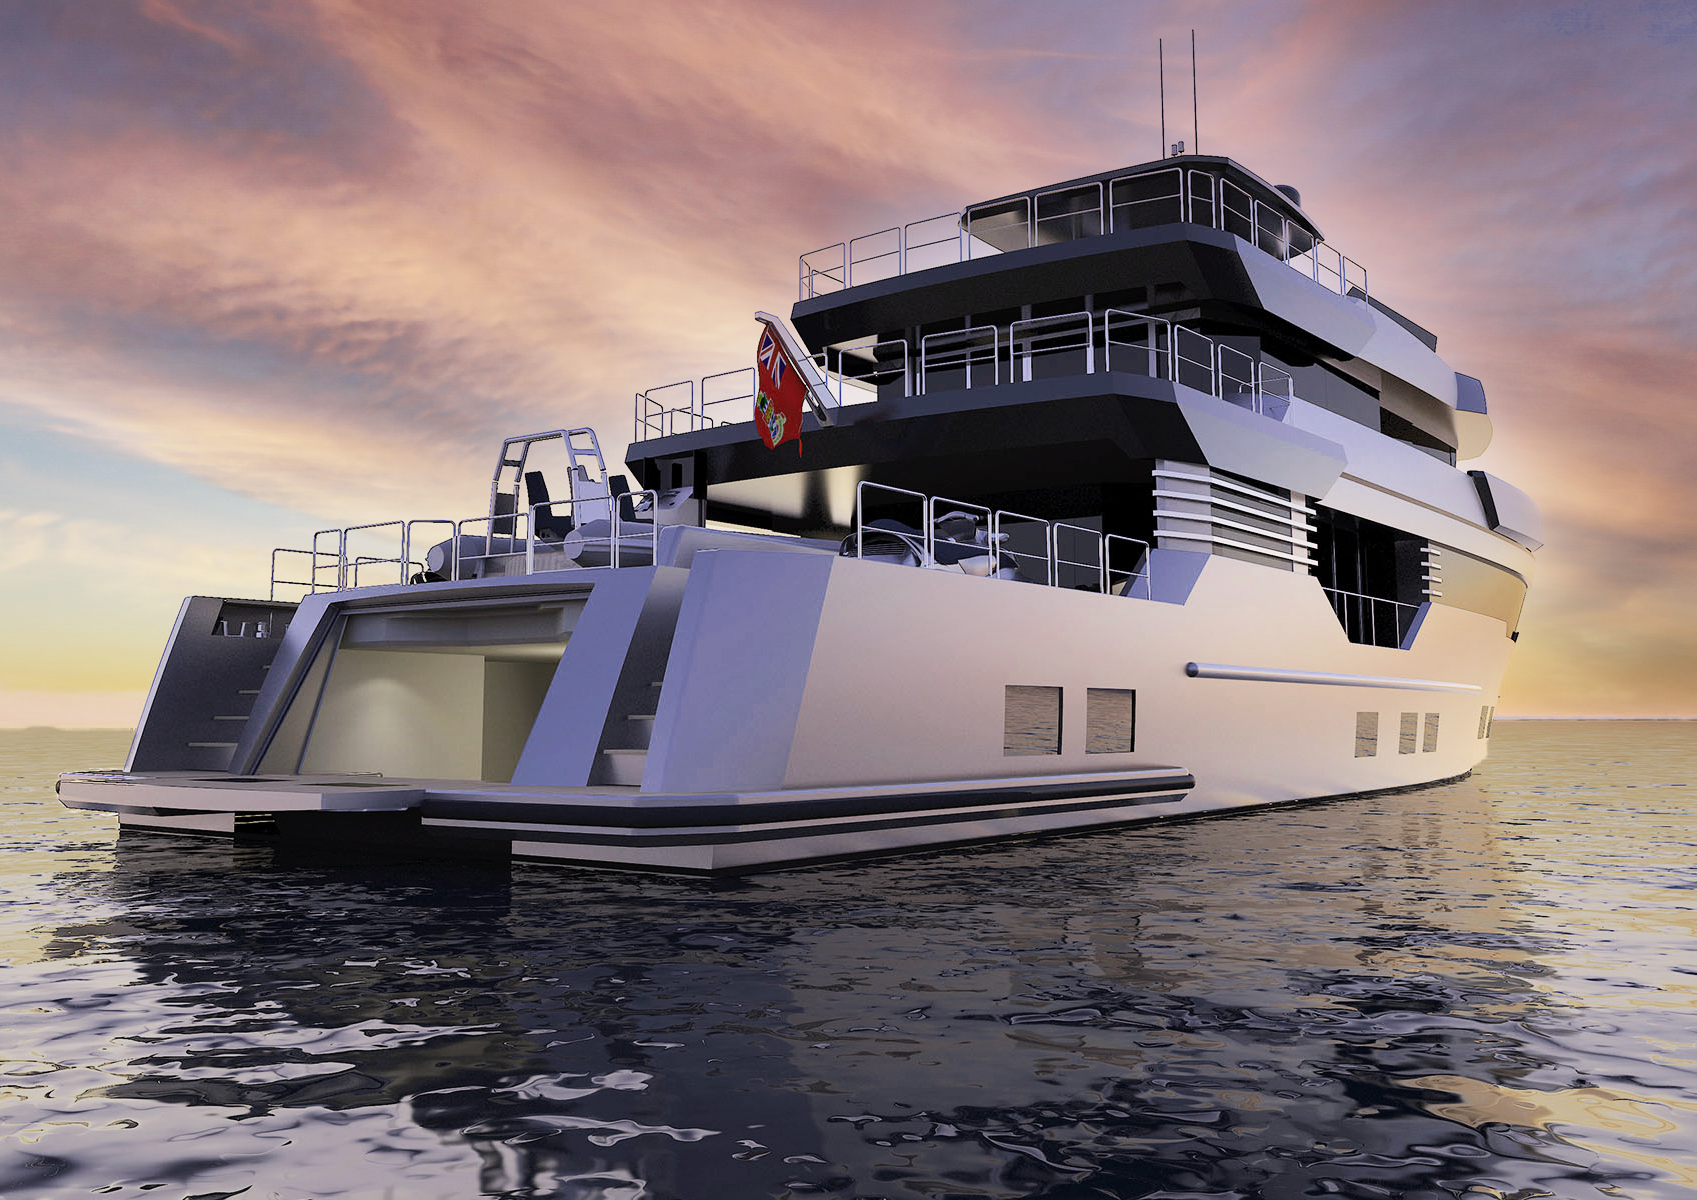 mod2_yacht-pacifico-32m-esterna